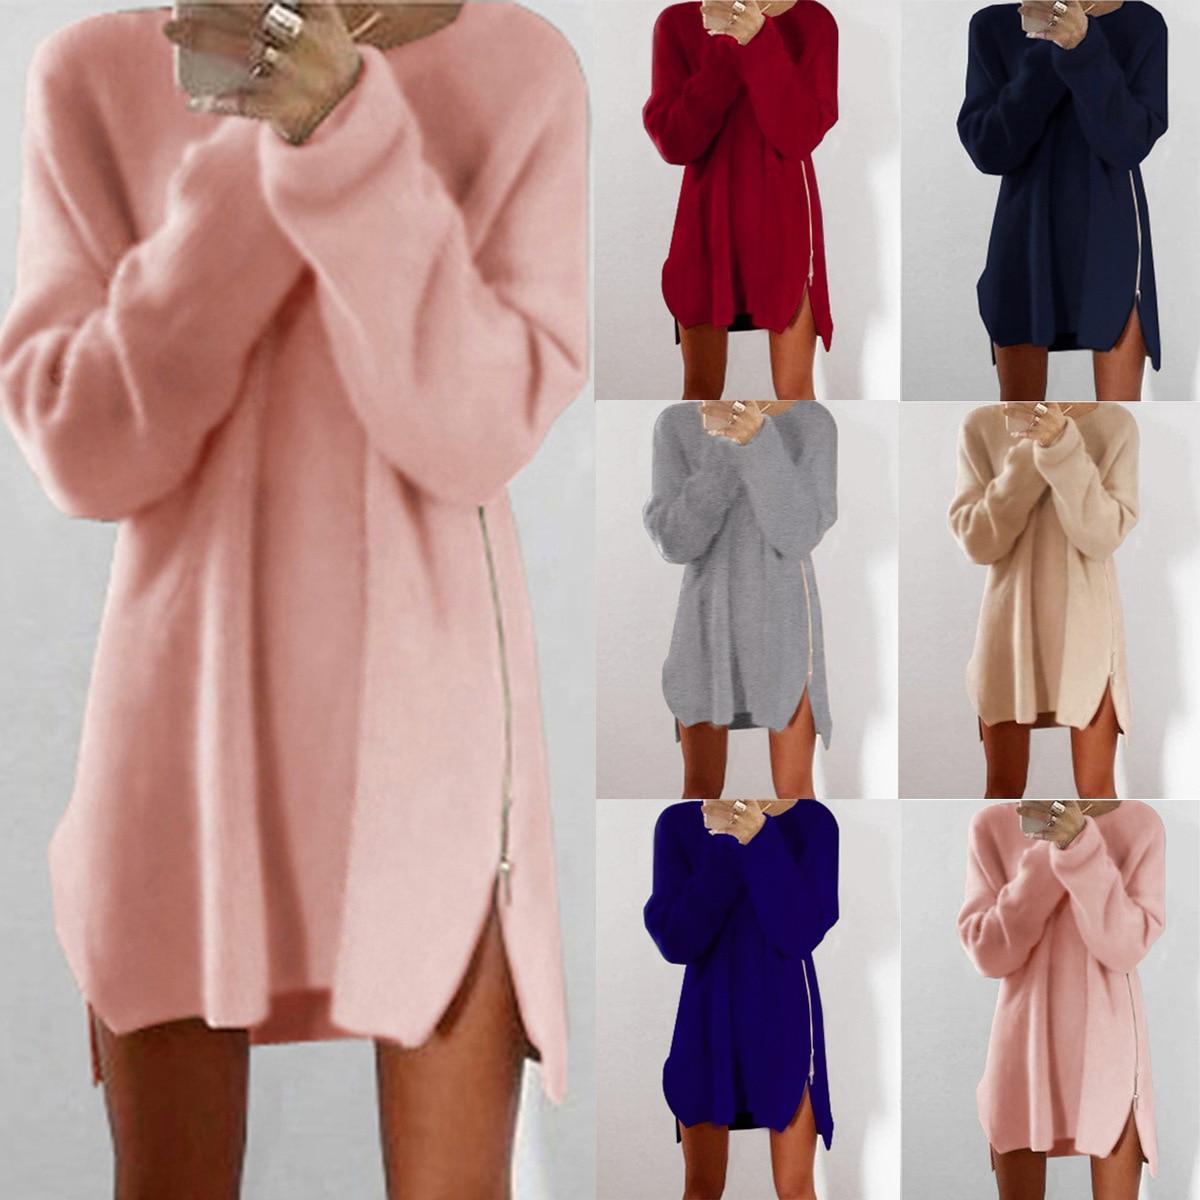 New Women Loose Fit Zipper Sweater Dress Plus Size Causal Pullover Side Zipper 5XL